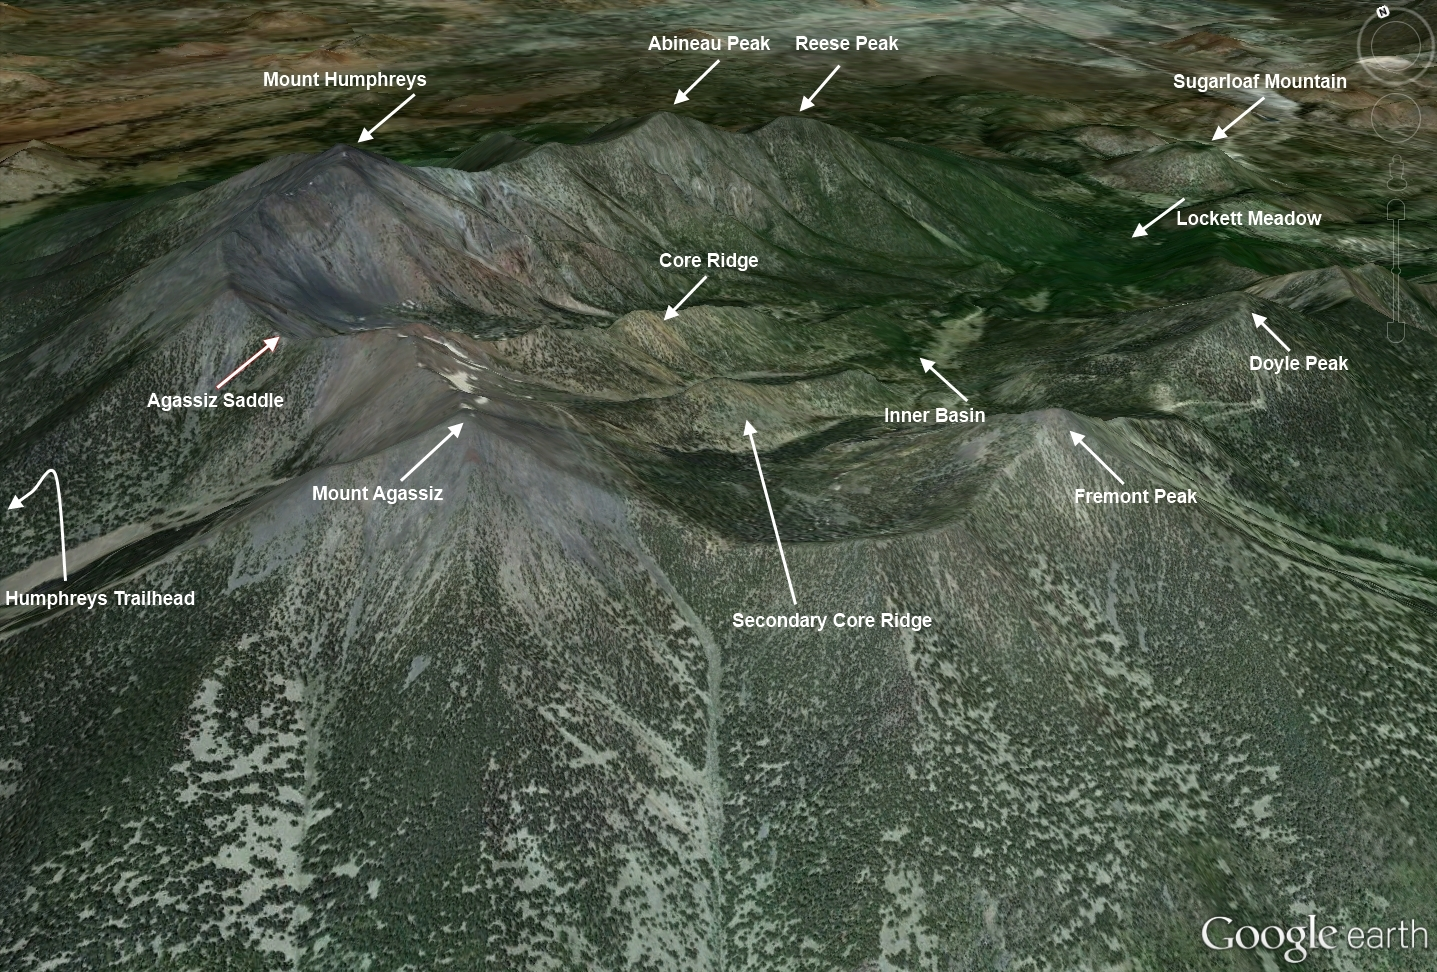 San Francisco Peaks clipart #5, Download drawings